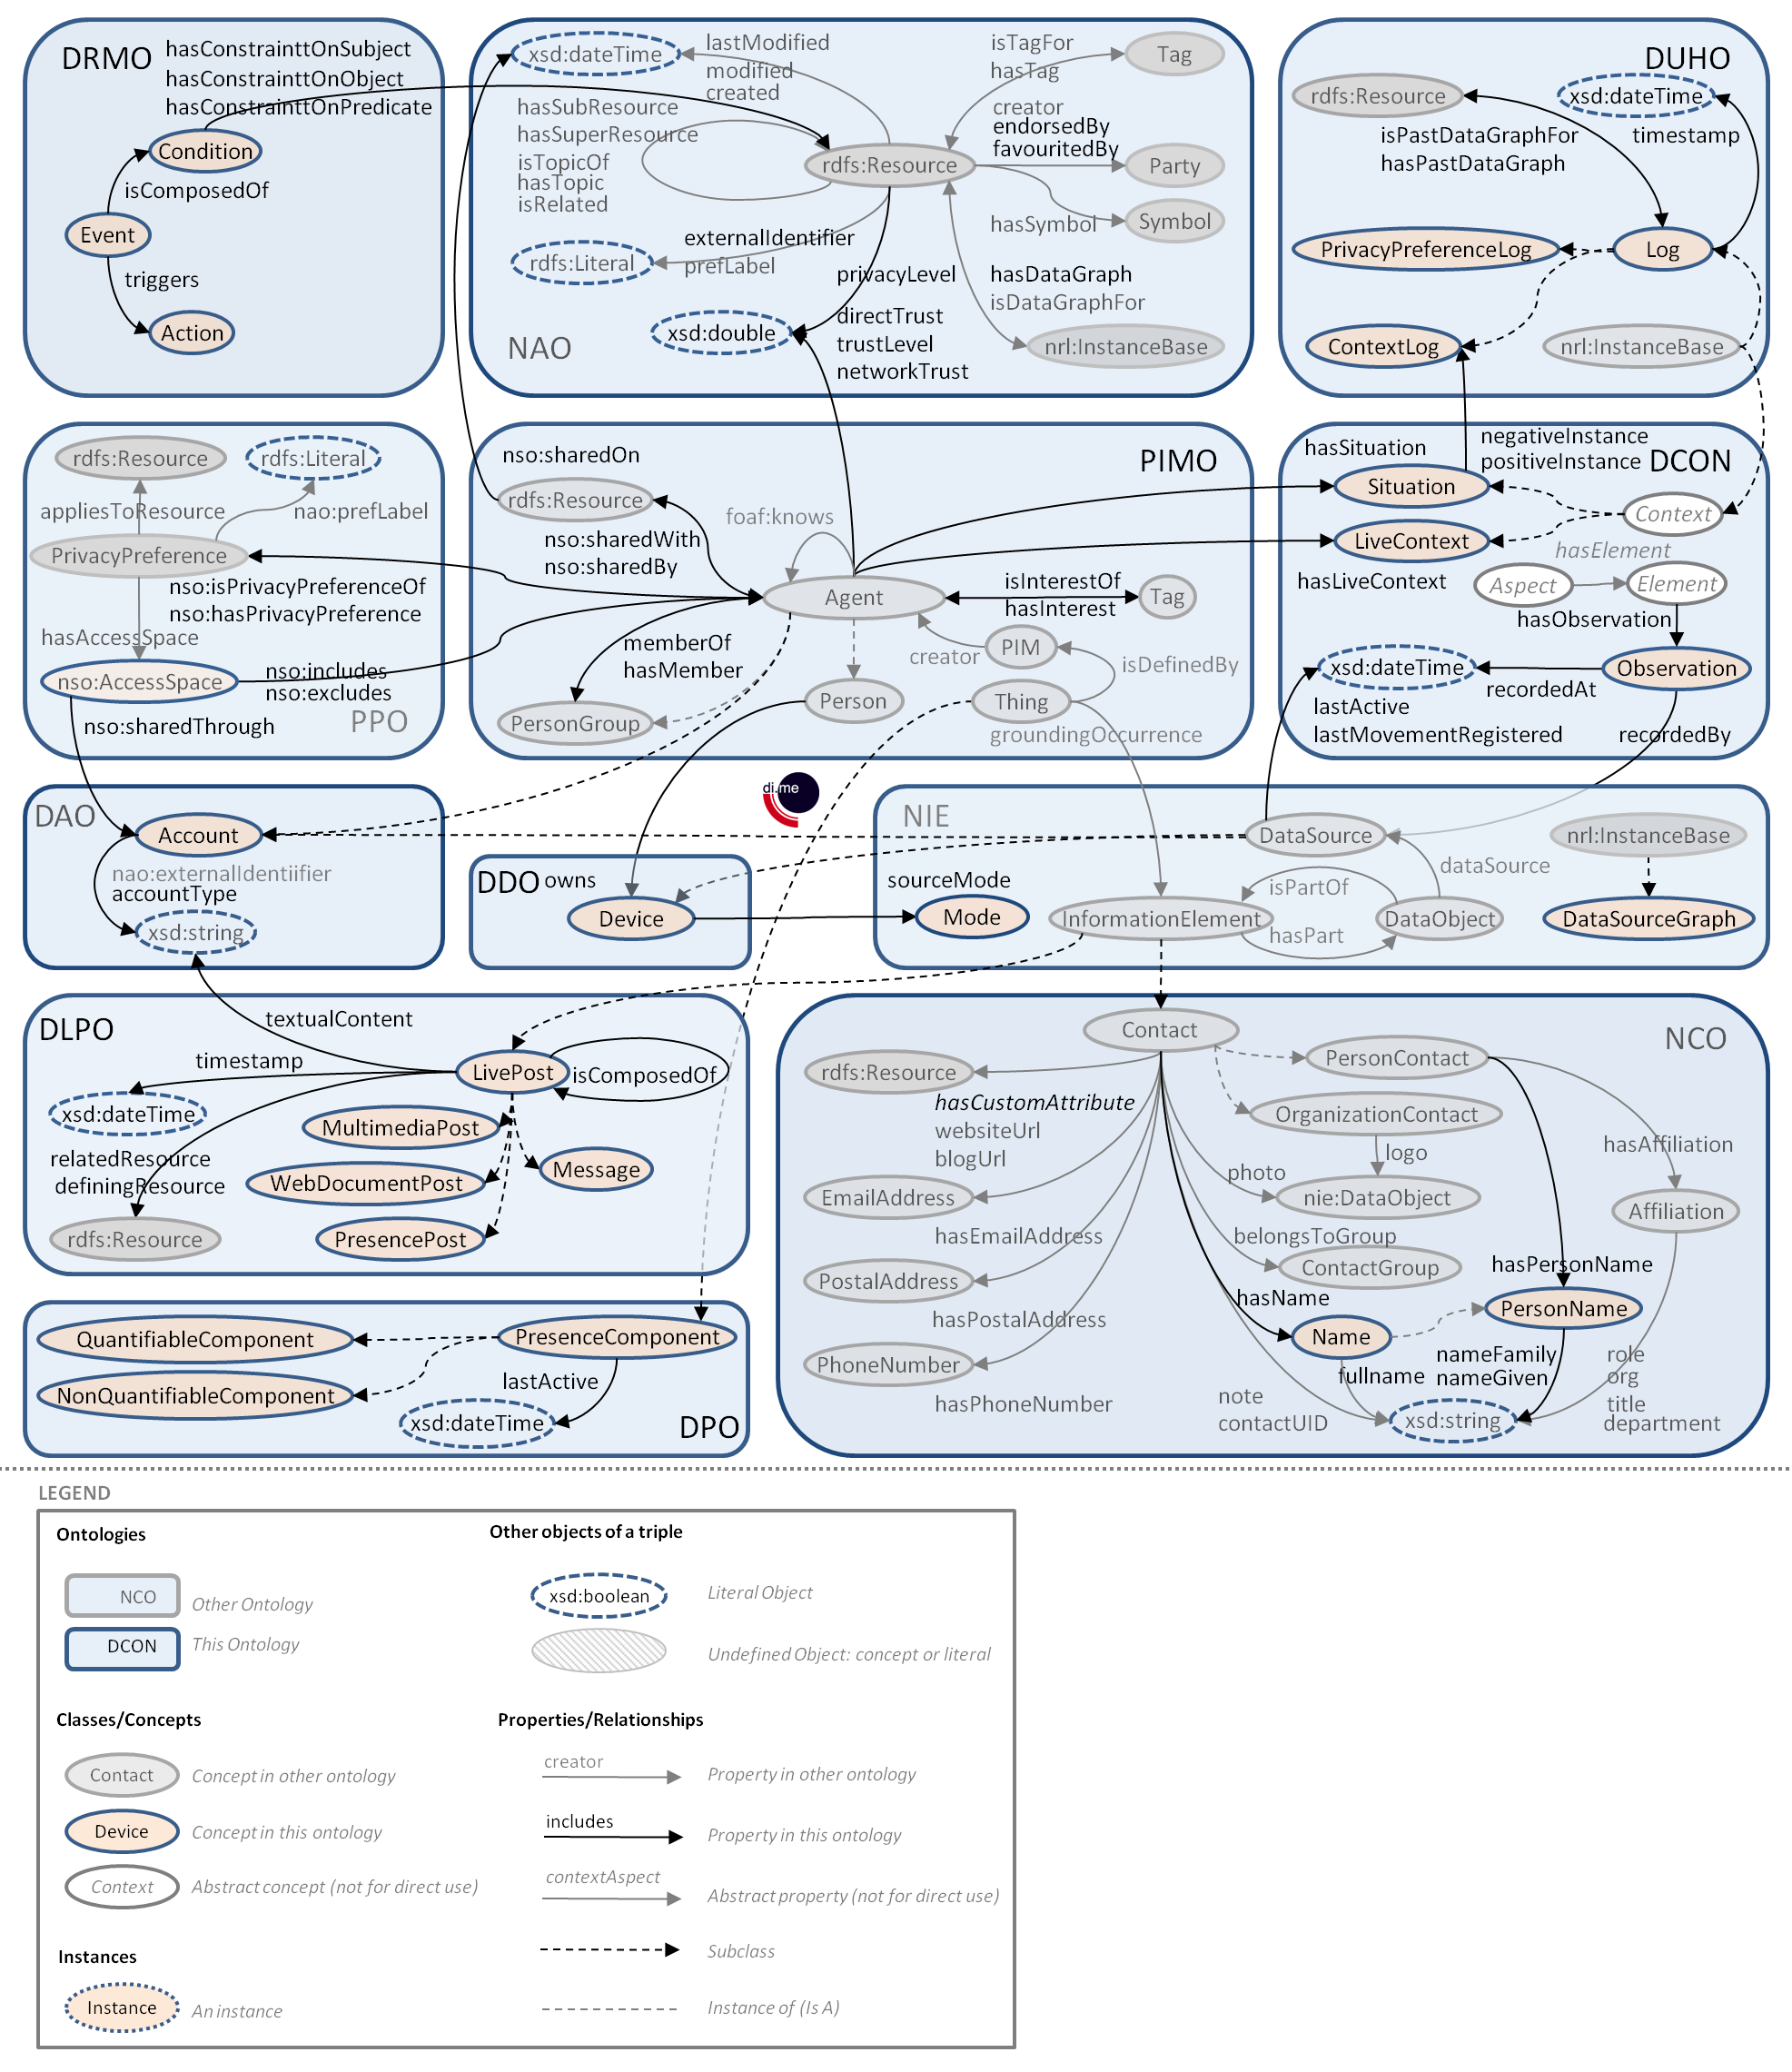 Visualisation of the Ontology Framework (simplifed)